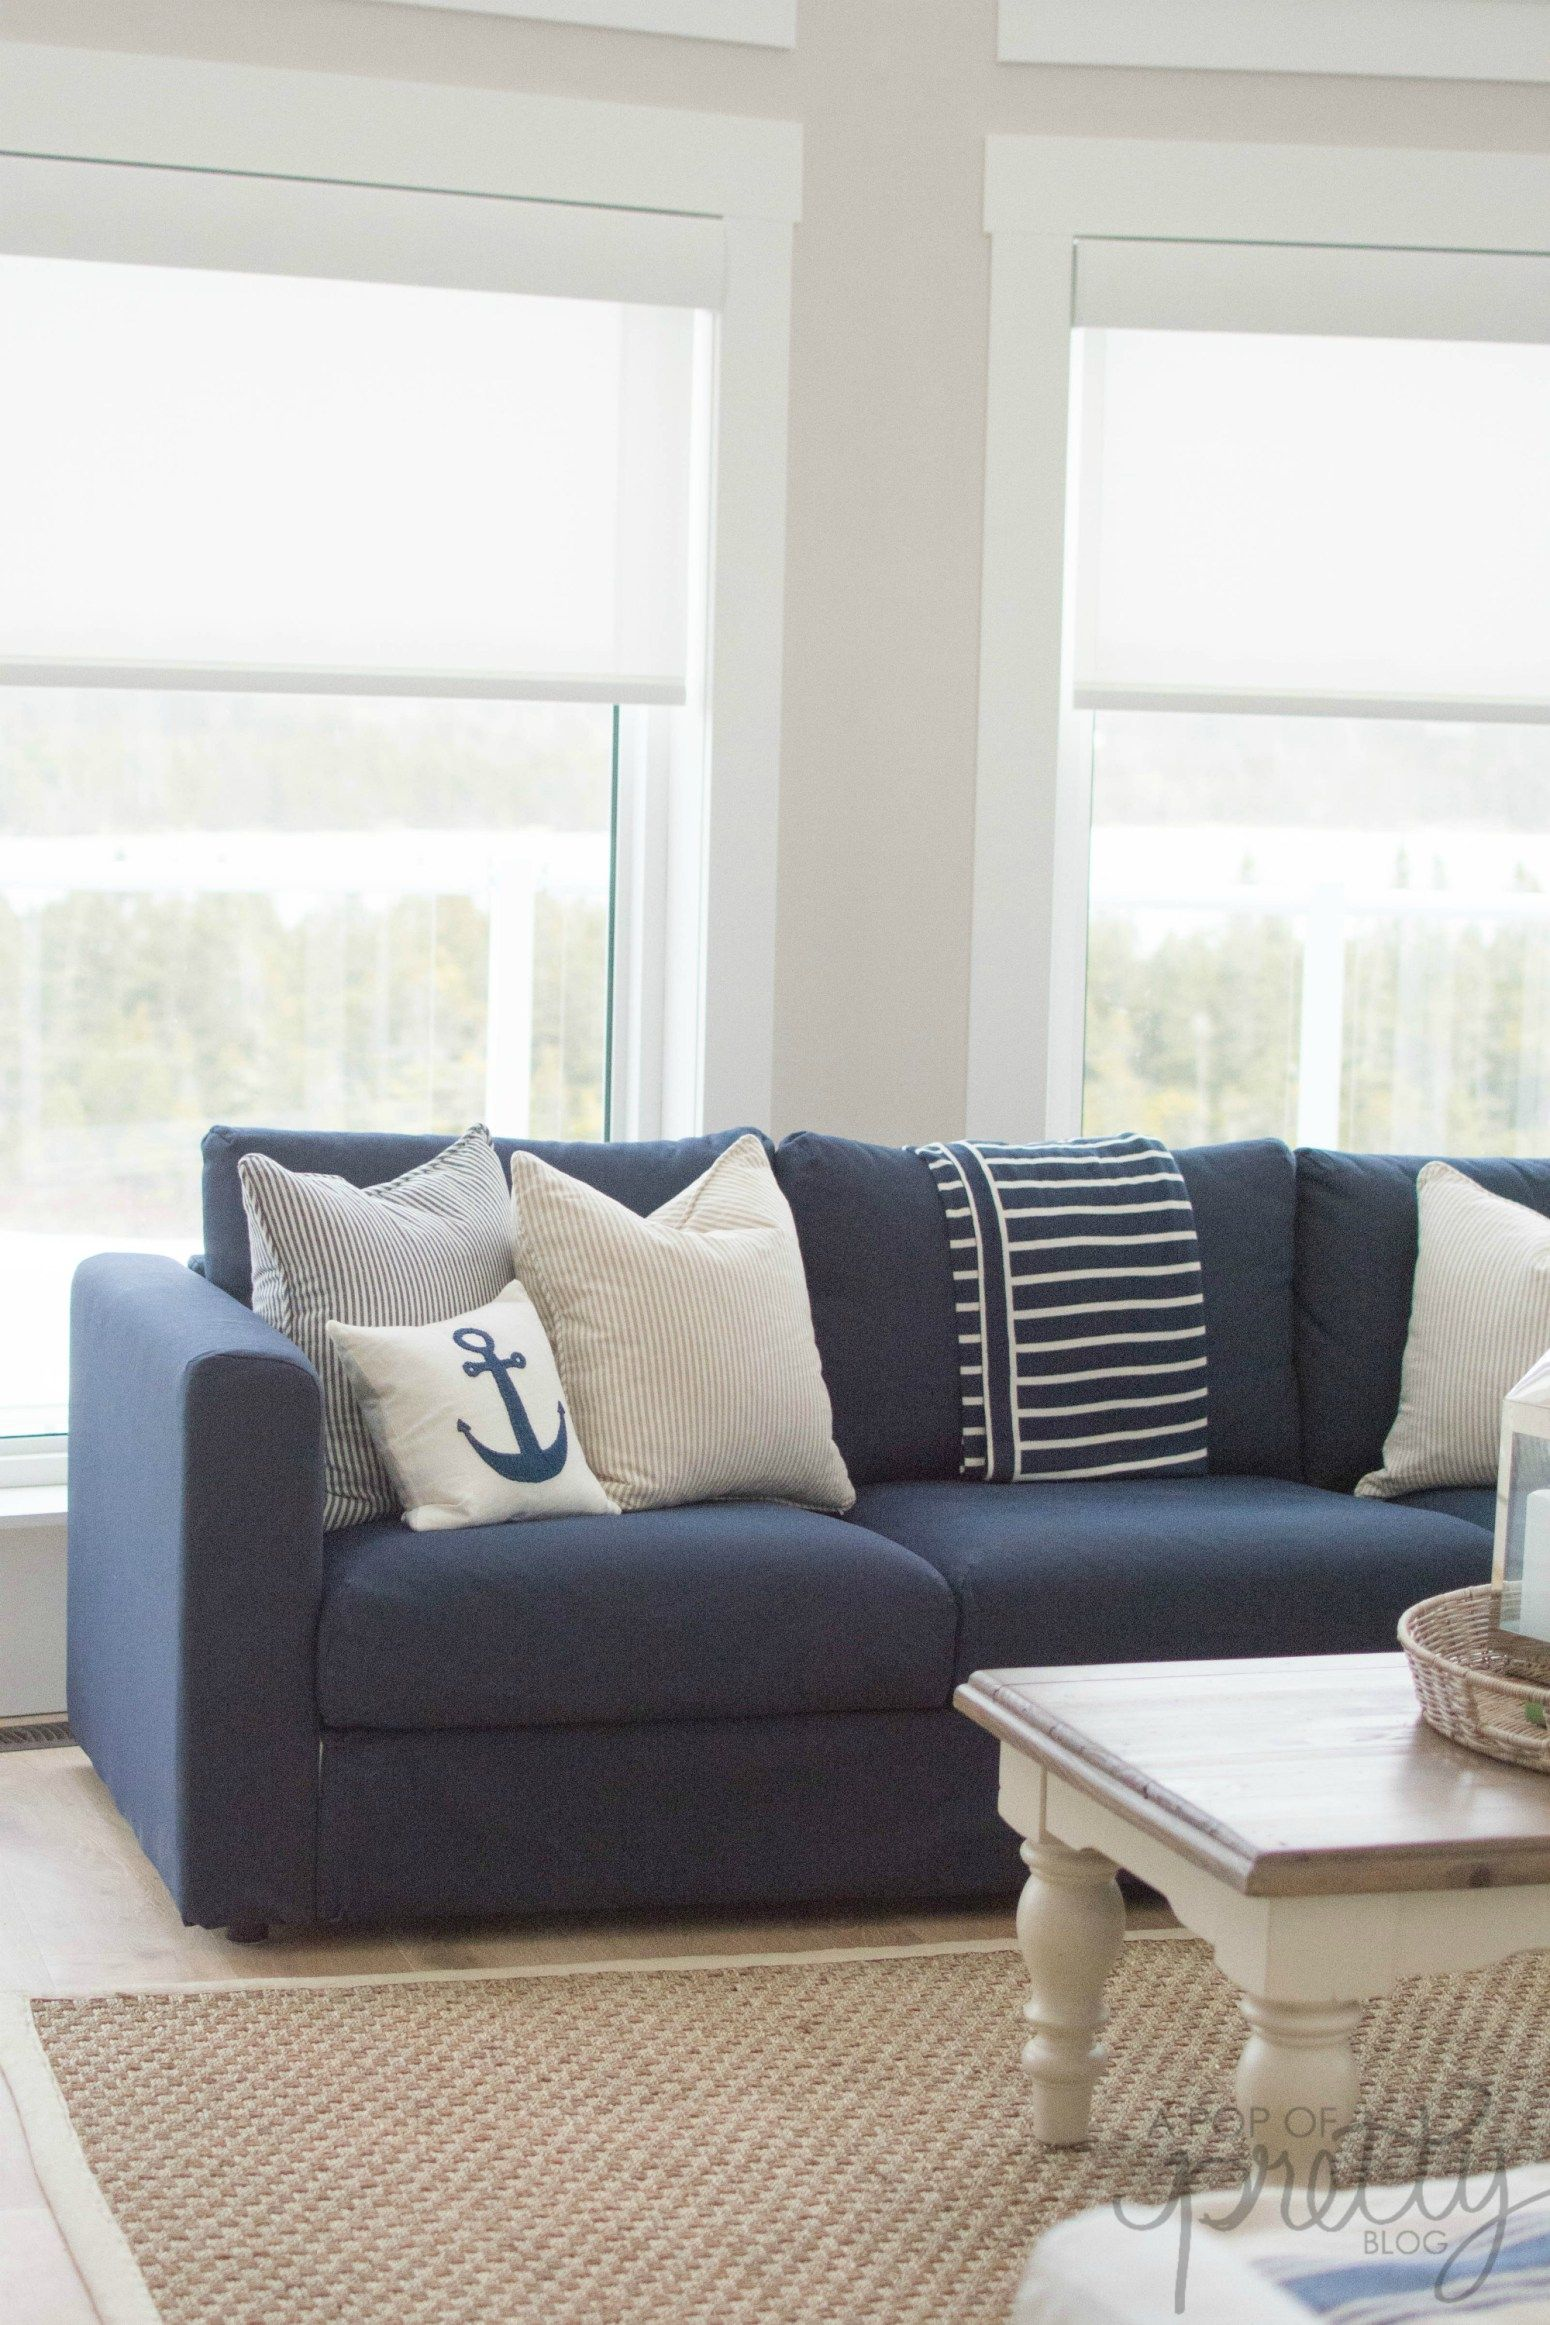 Sofasofa Reviews Sofa Bed 3 Seater Canberra Our Ikea Vimle Initial Review Naples Condo